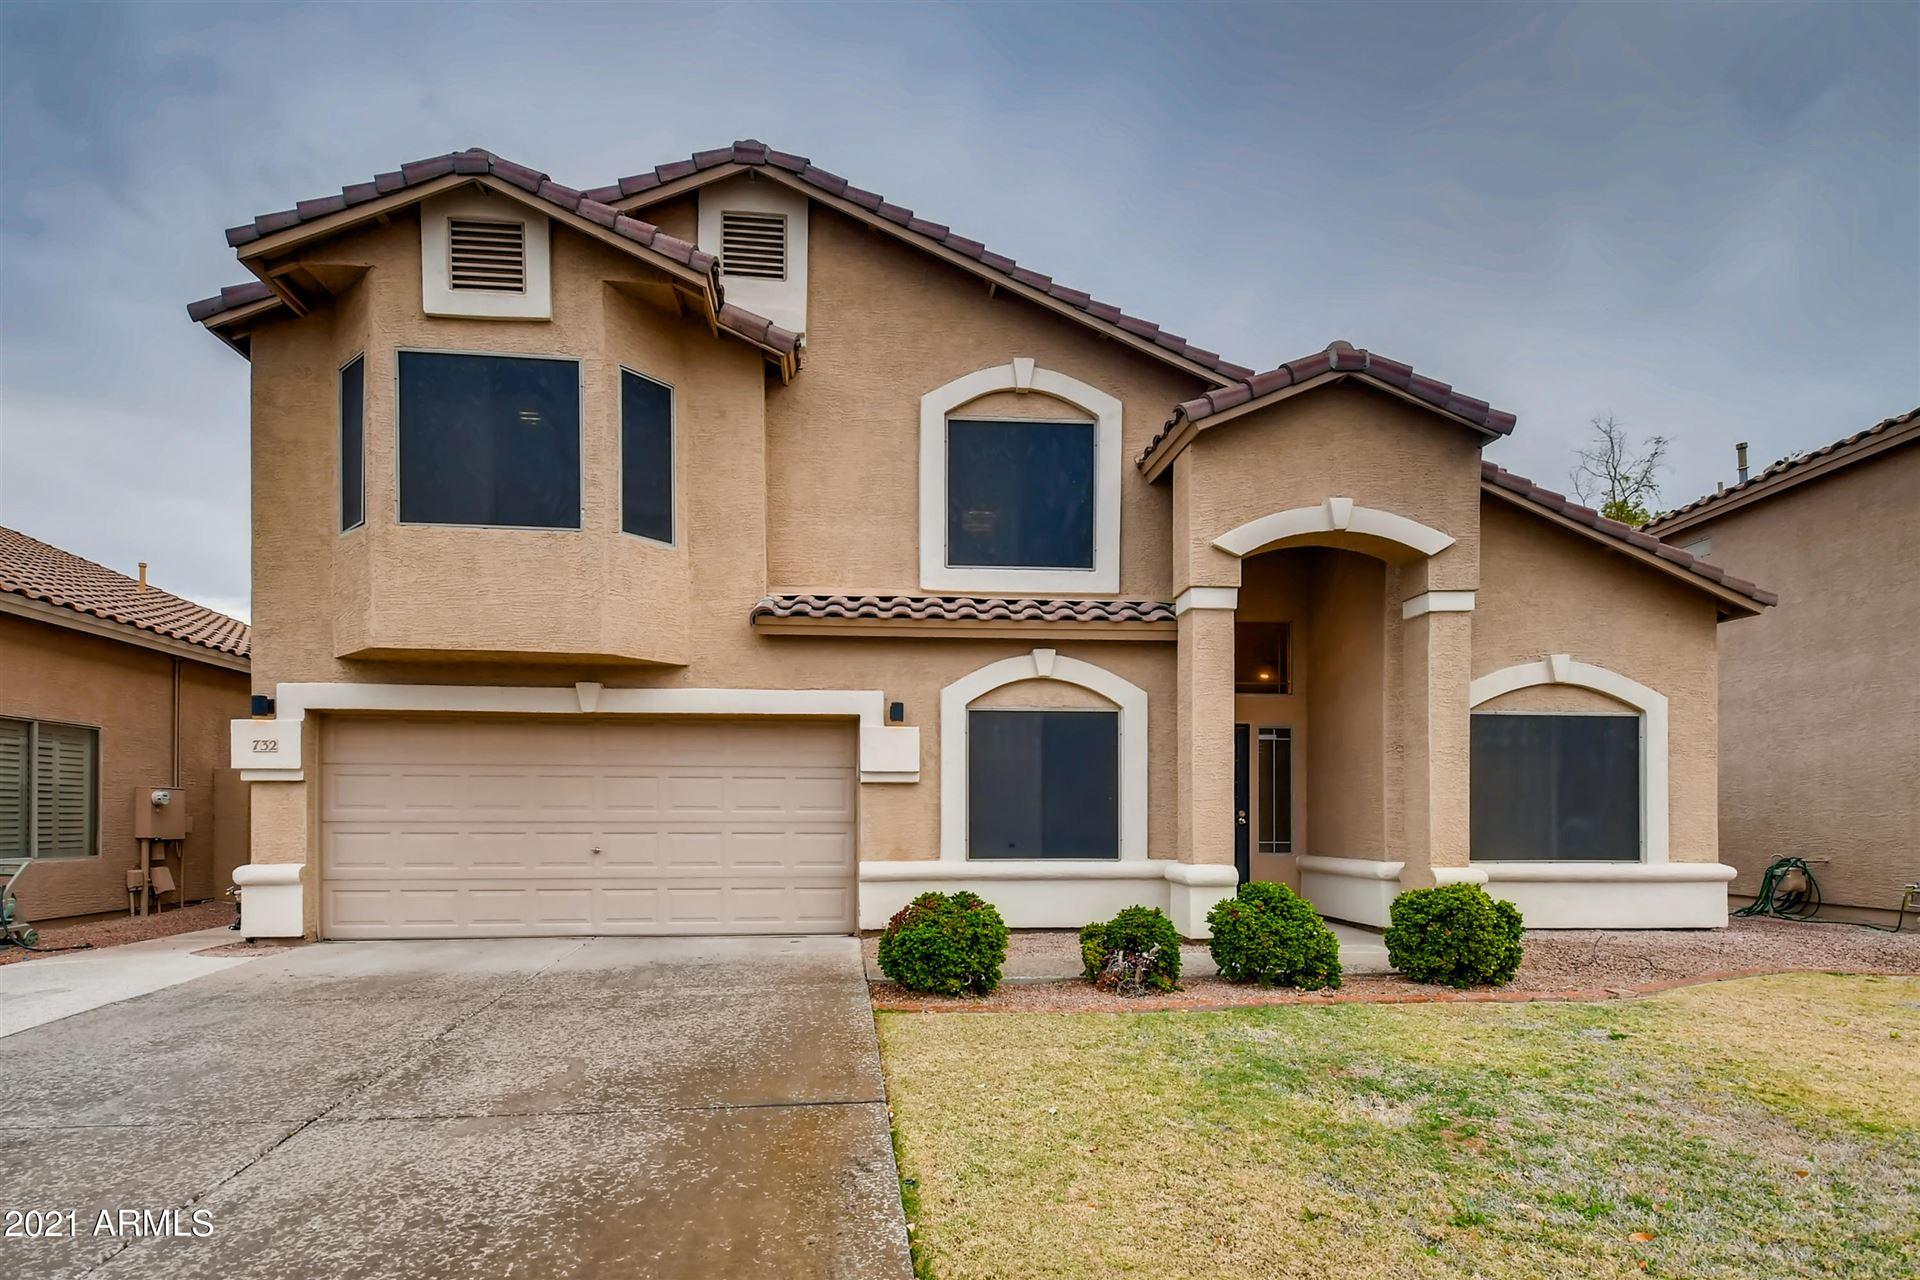 732 W MOORE Avenue, Gilbert, AZ 85233 - MLS#: 6185050